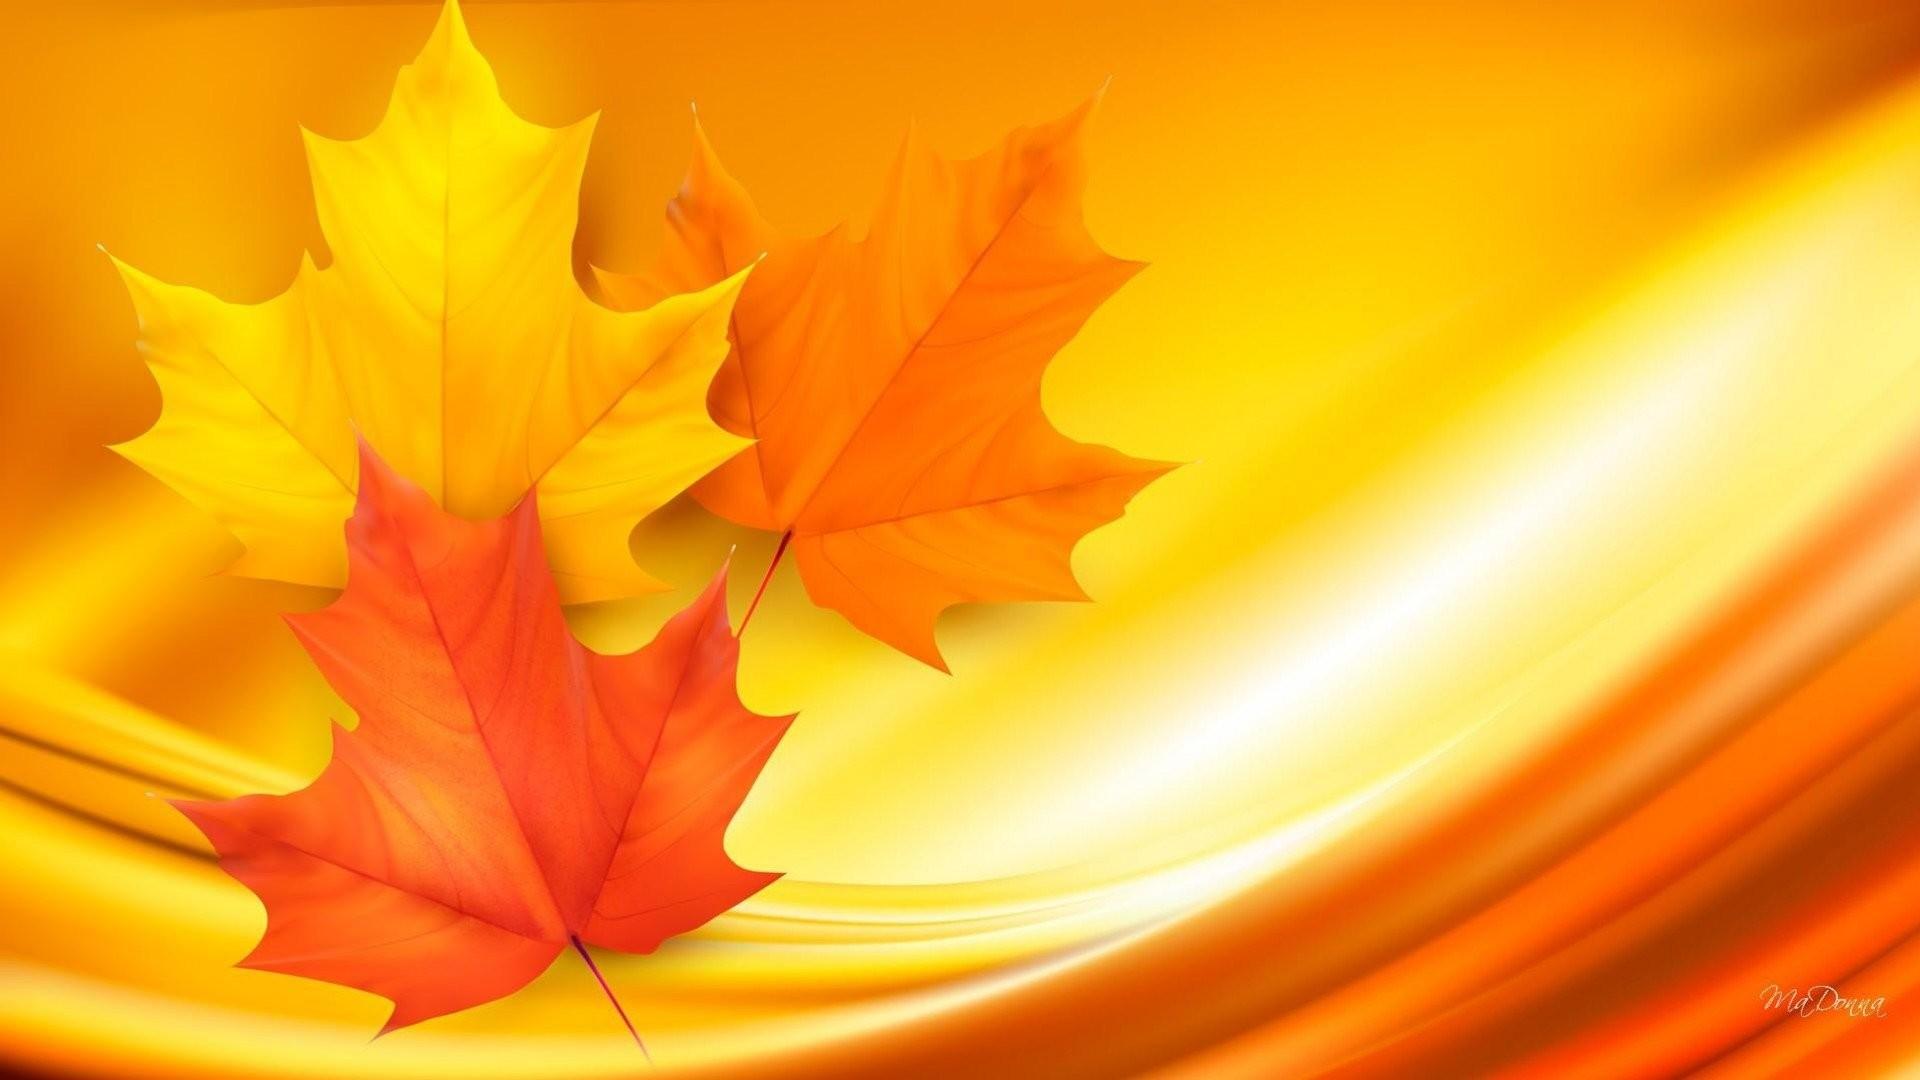 Artistic – Fall Artistic Leaf Maple Leaf Orange Yellow Wallpaper